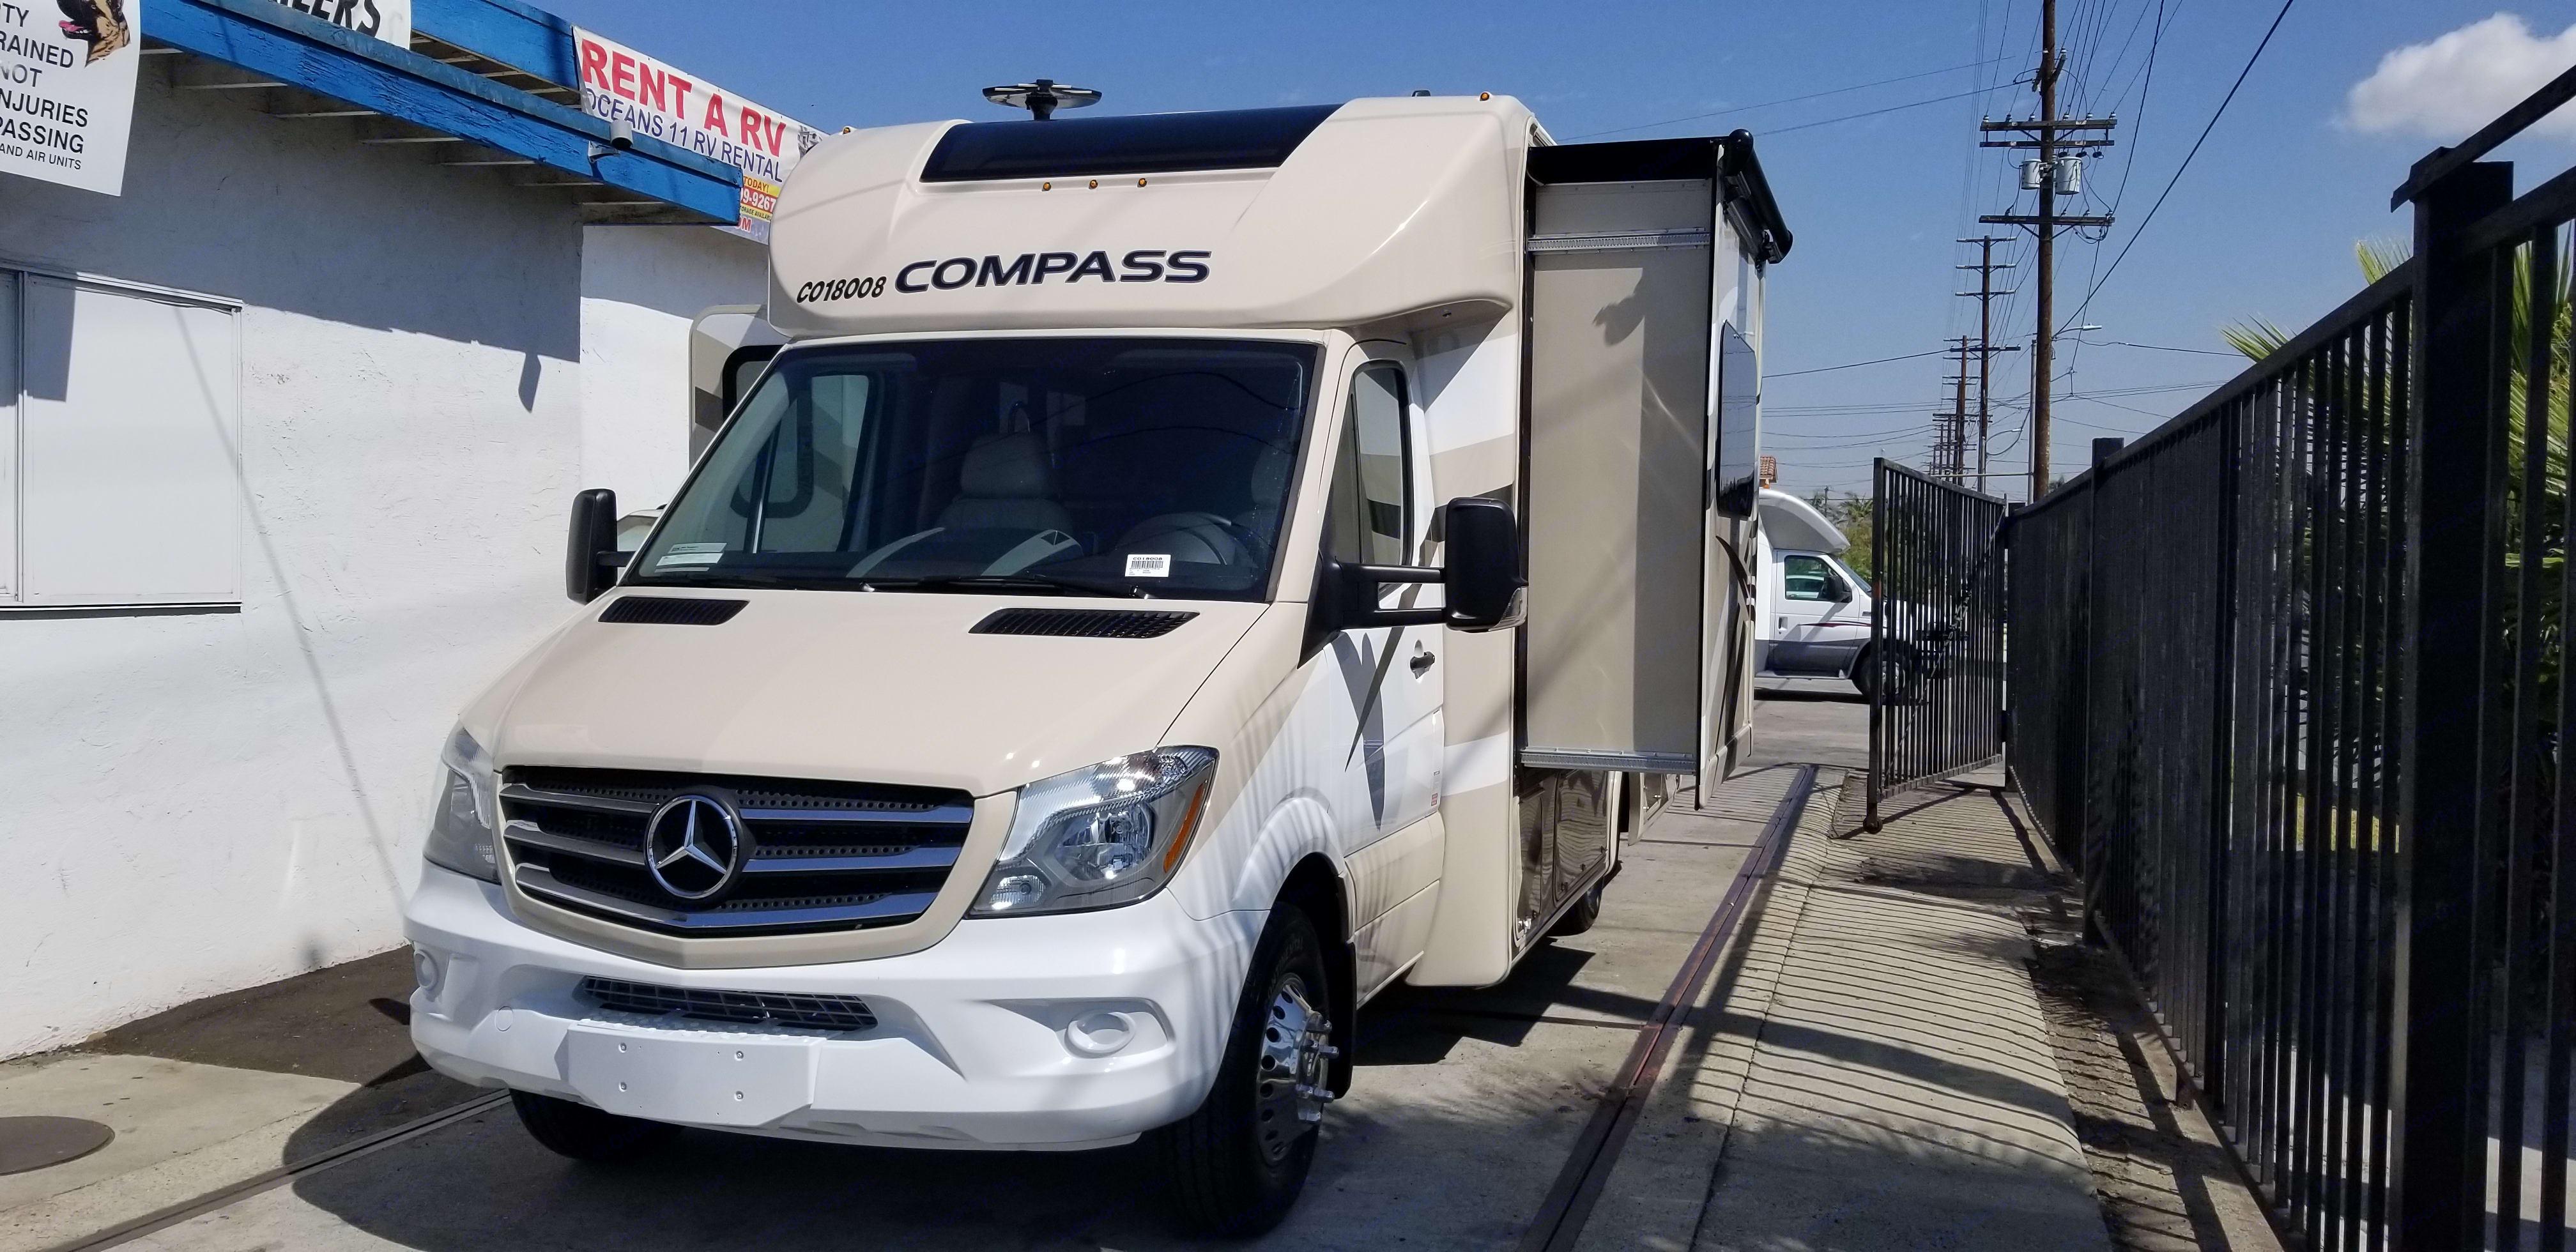 Thor Motor Coach compass 2018